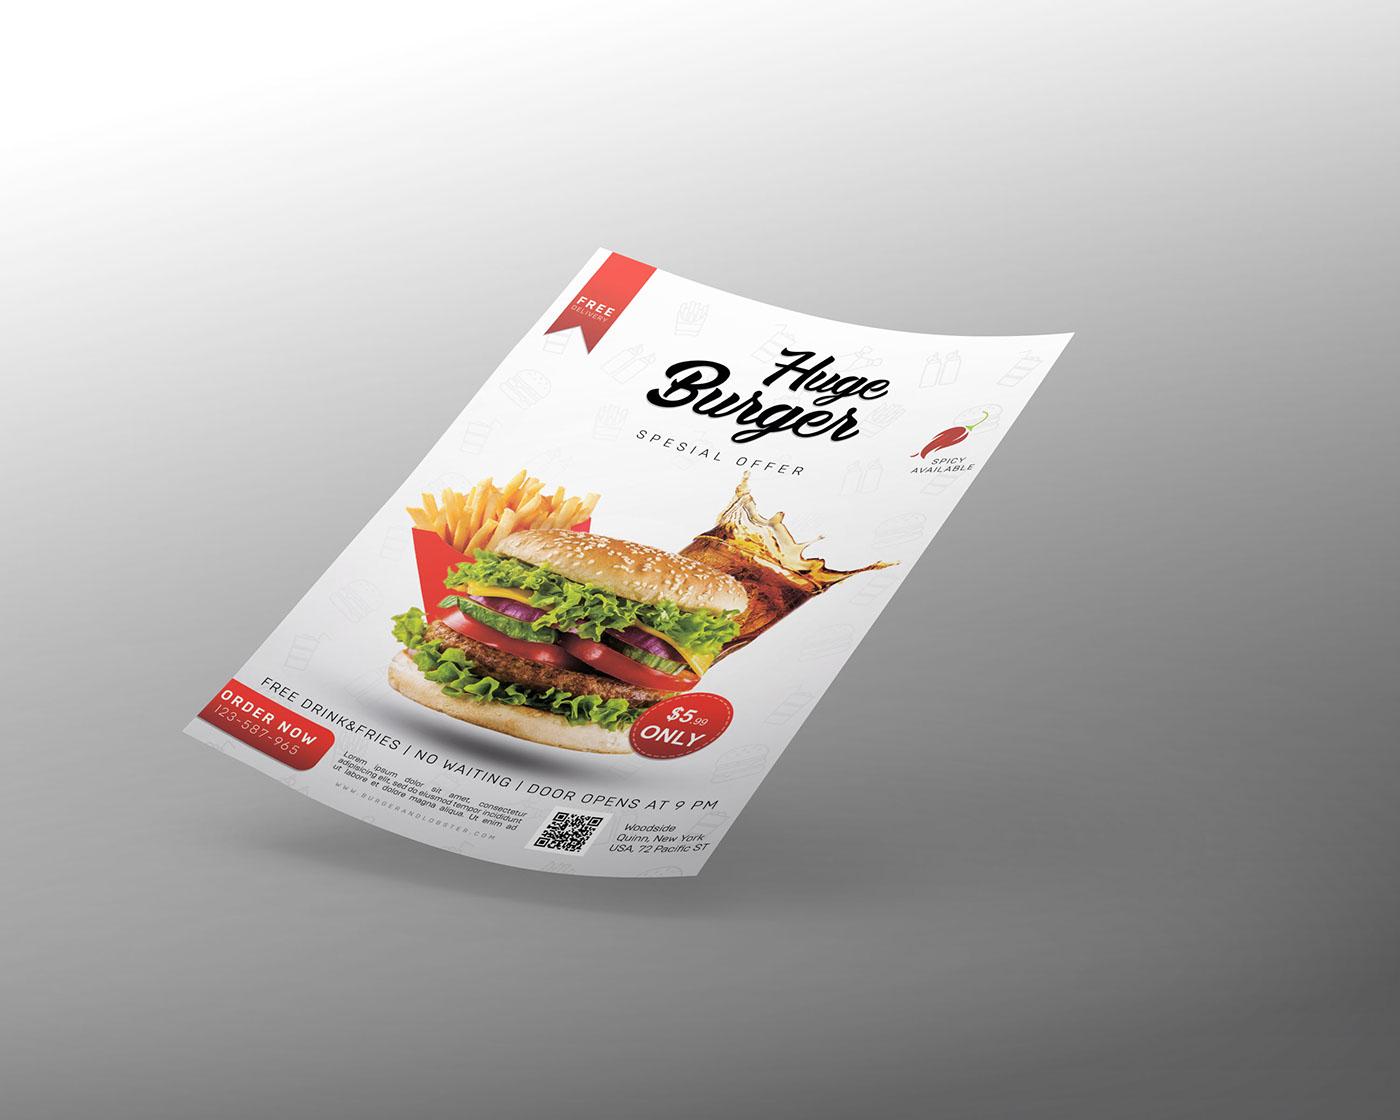 burger flyer free psd design olhaahafonova флаер флаєр бургер mock-up mockup download